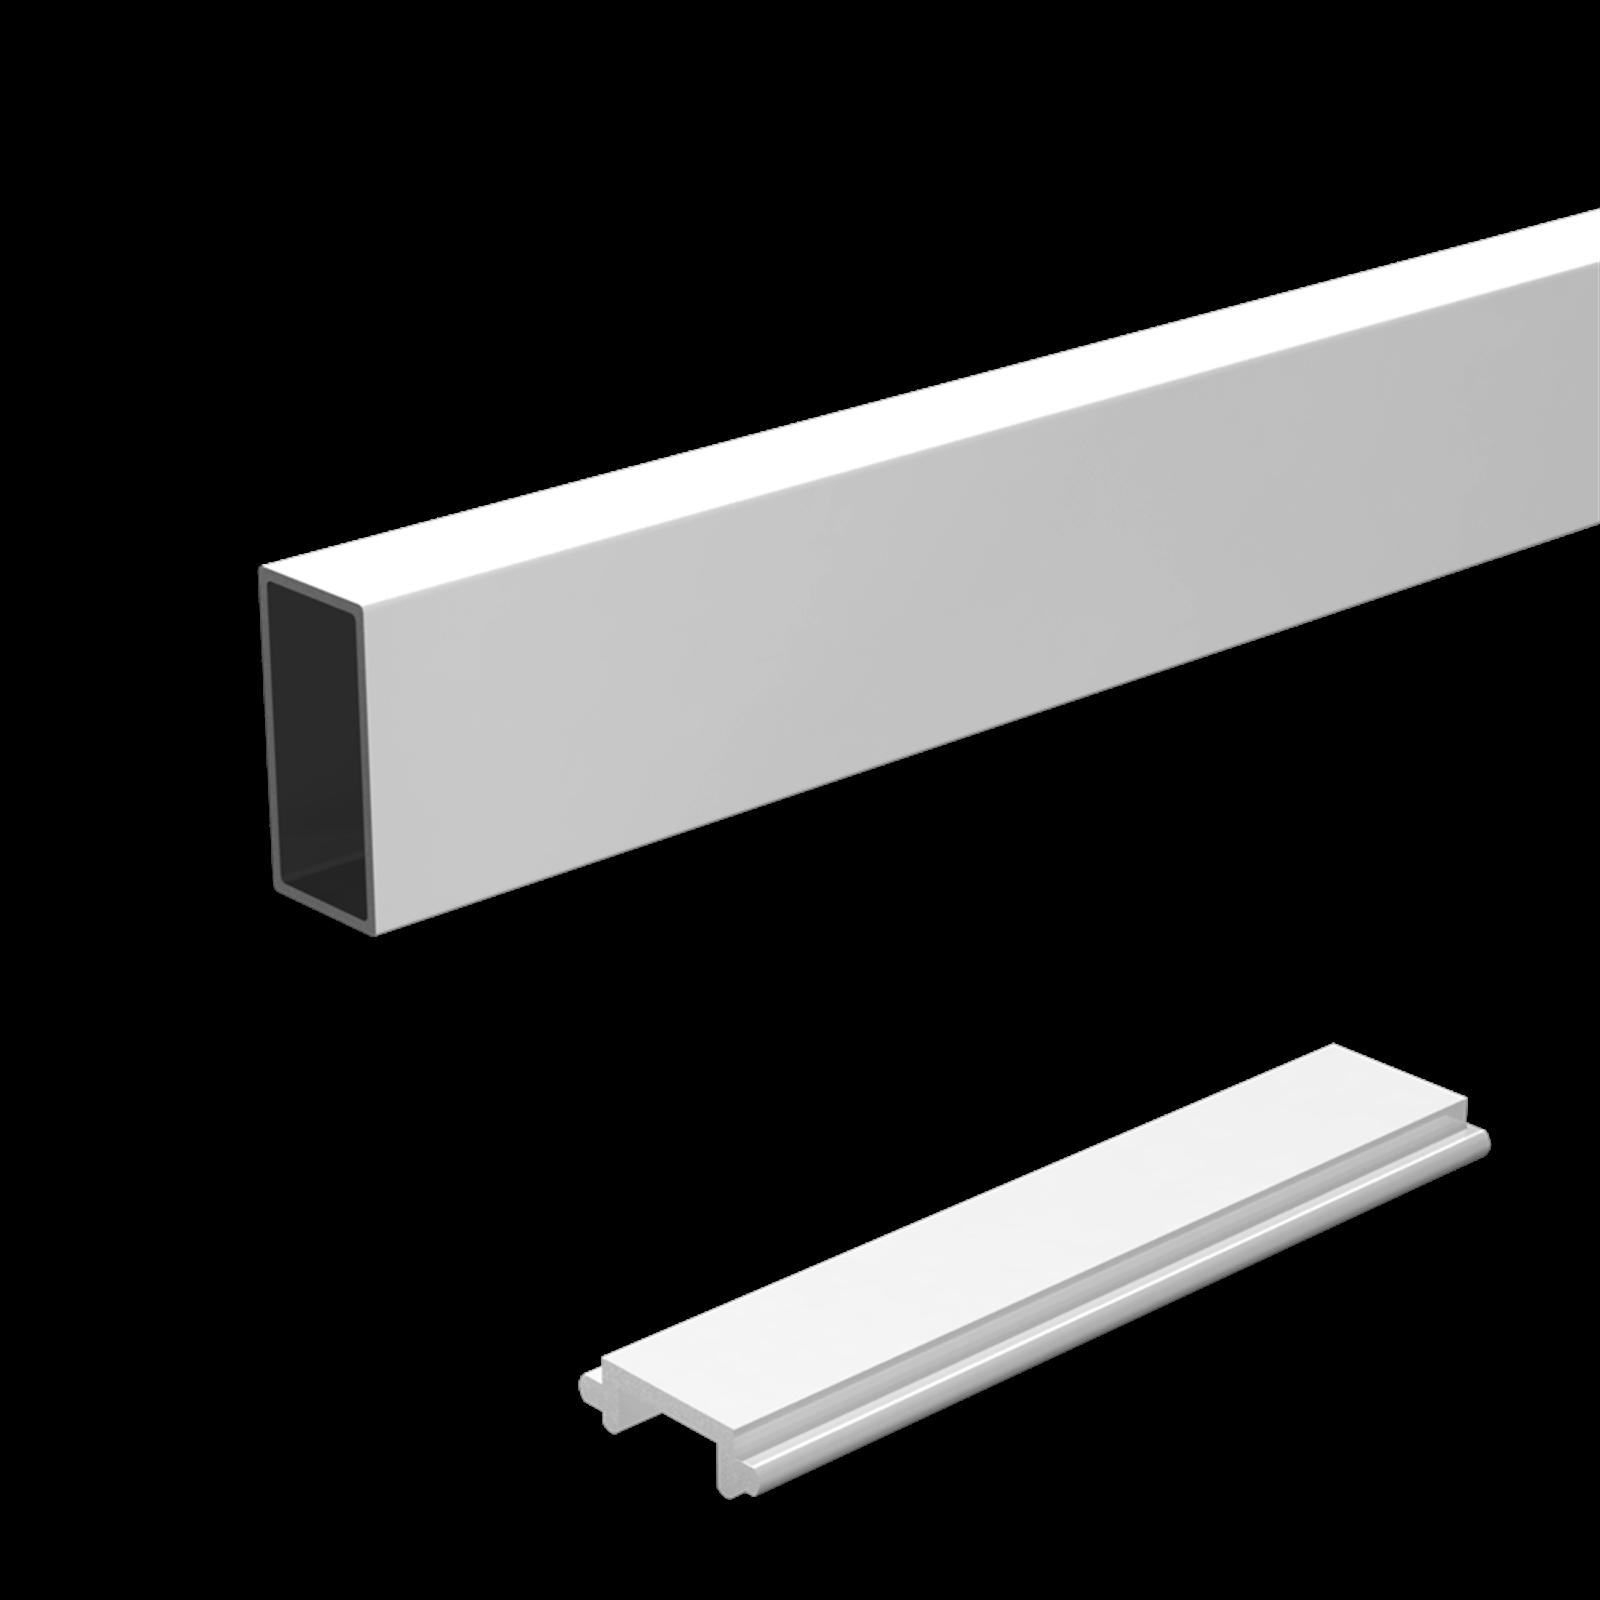 Peak 1800mm Aluminium Balustrade Wide Baluster And Spacer Kit